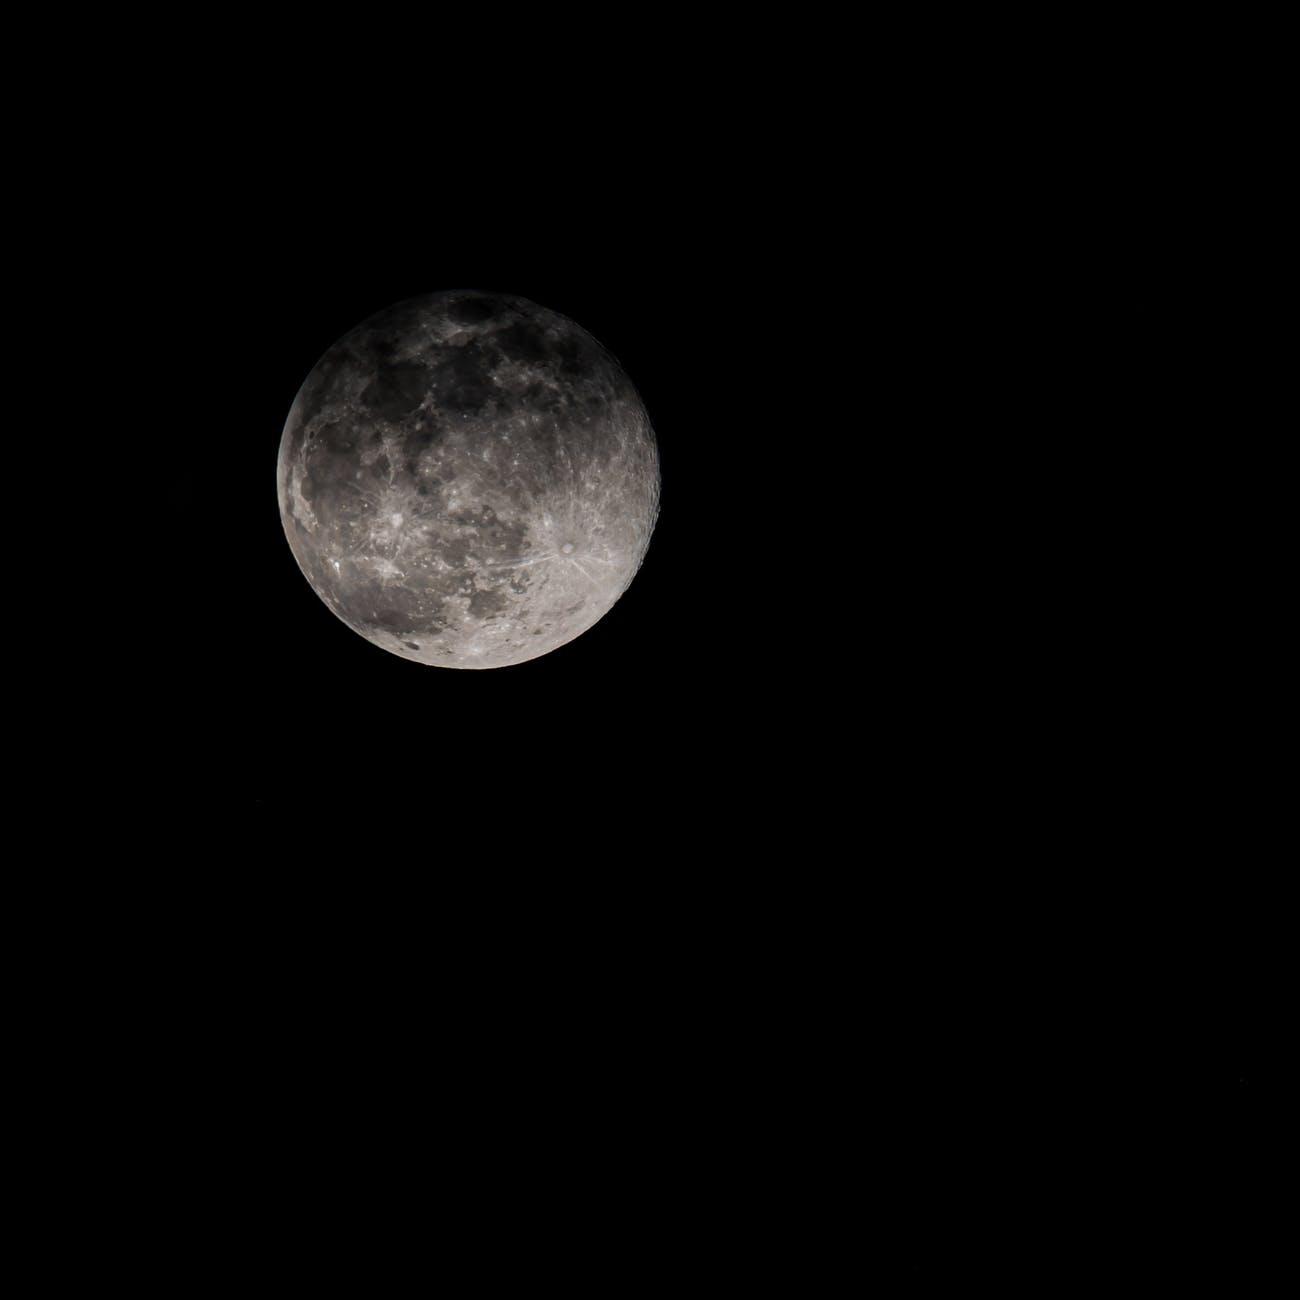 full moon shining on black background